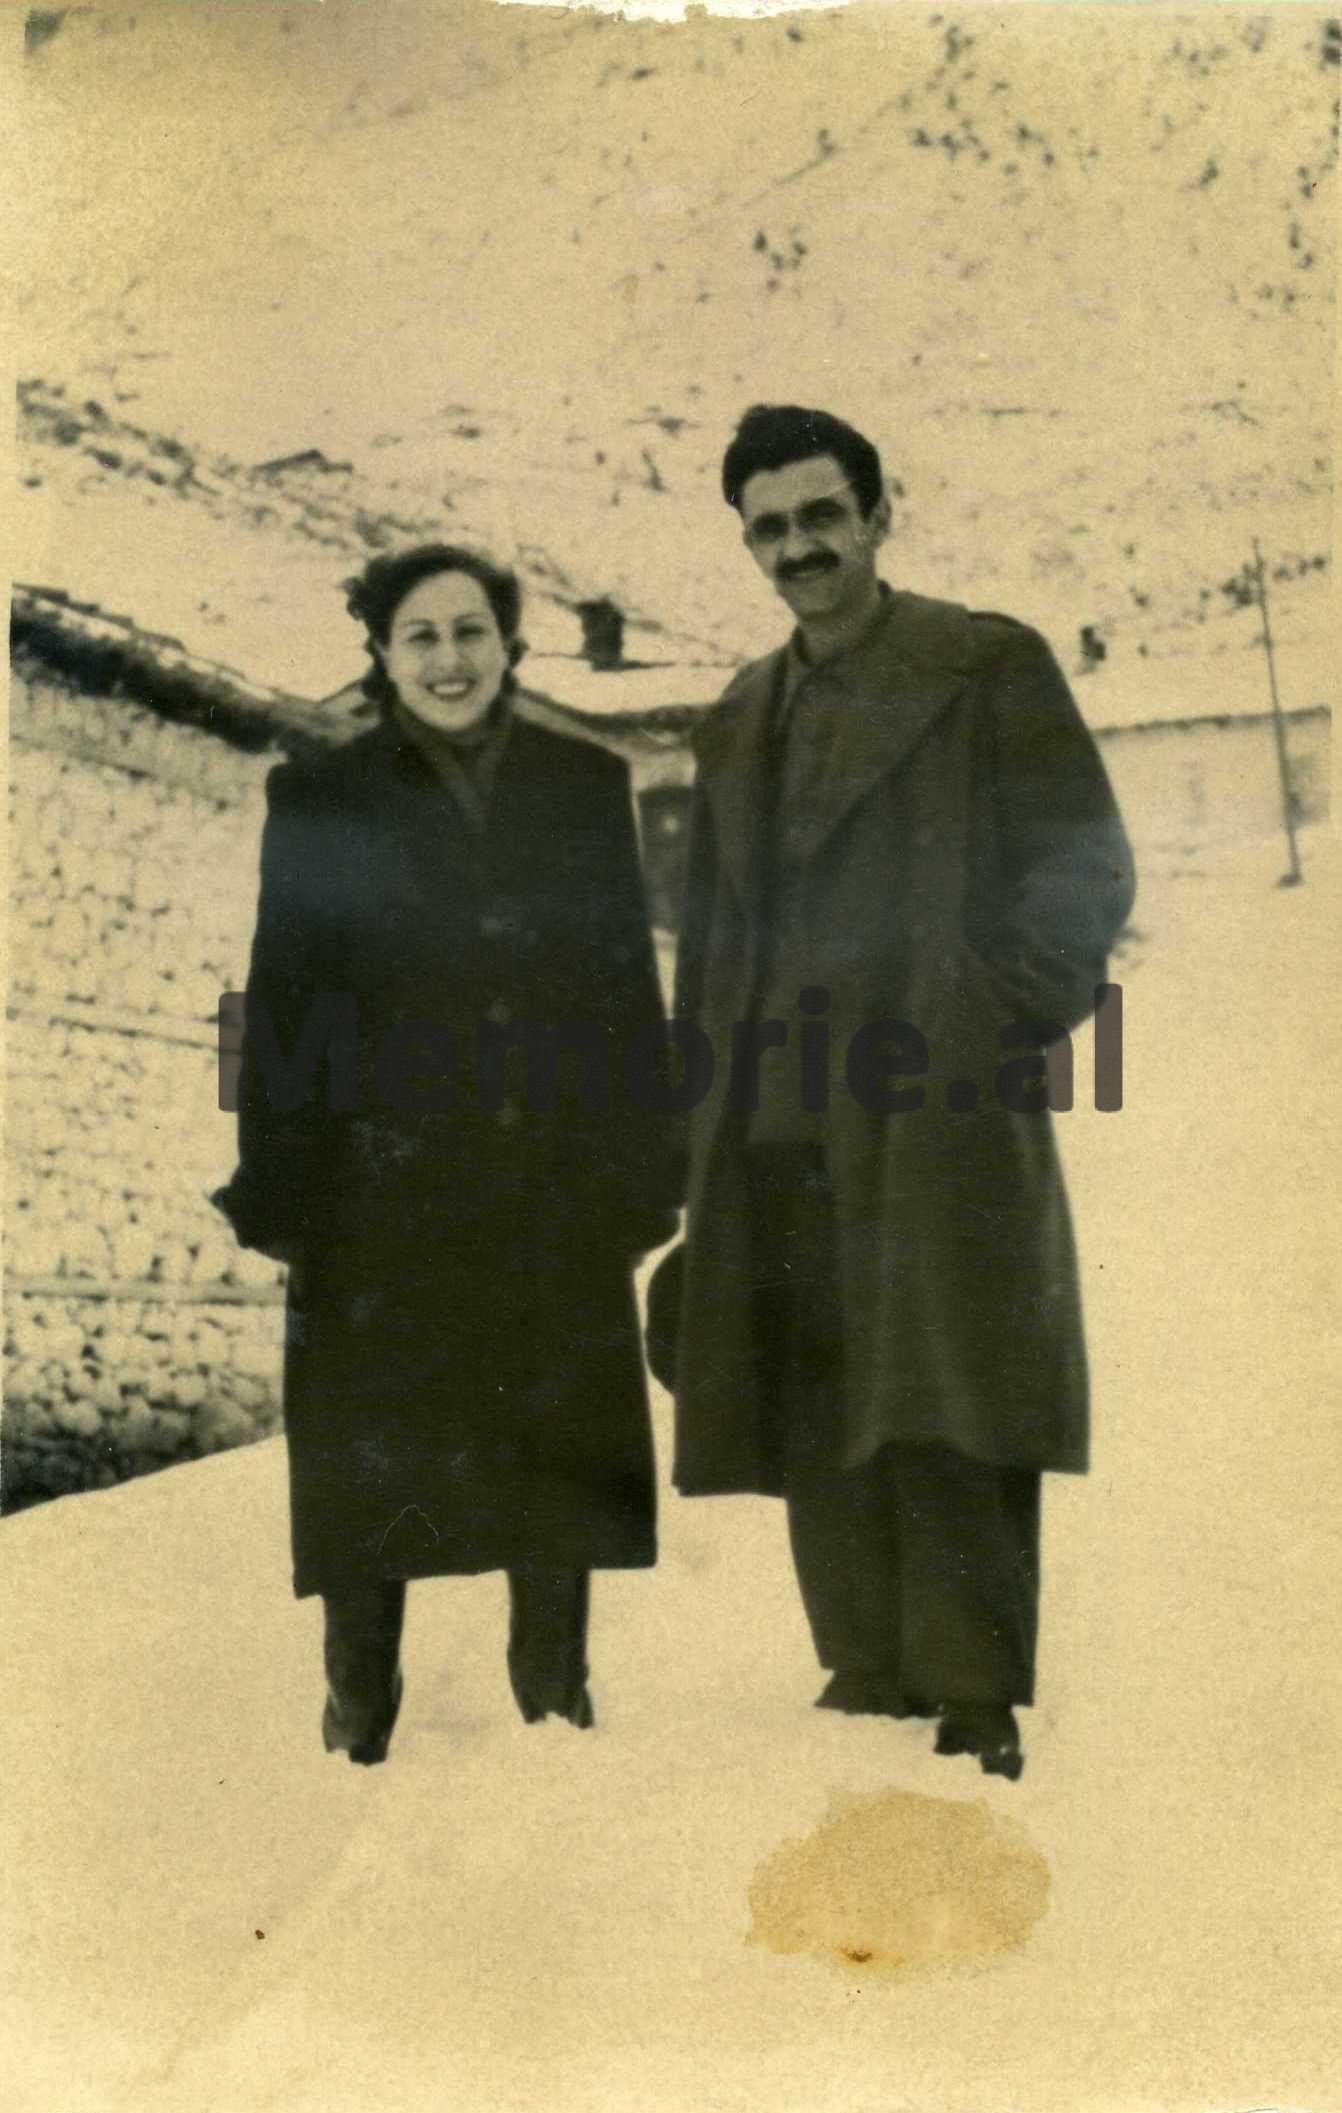 Me-bashkeshorten-Vezire-Batalli-Manço.-Bulqize-1958